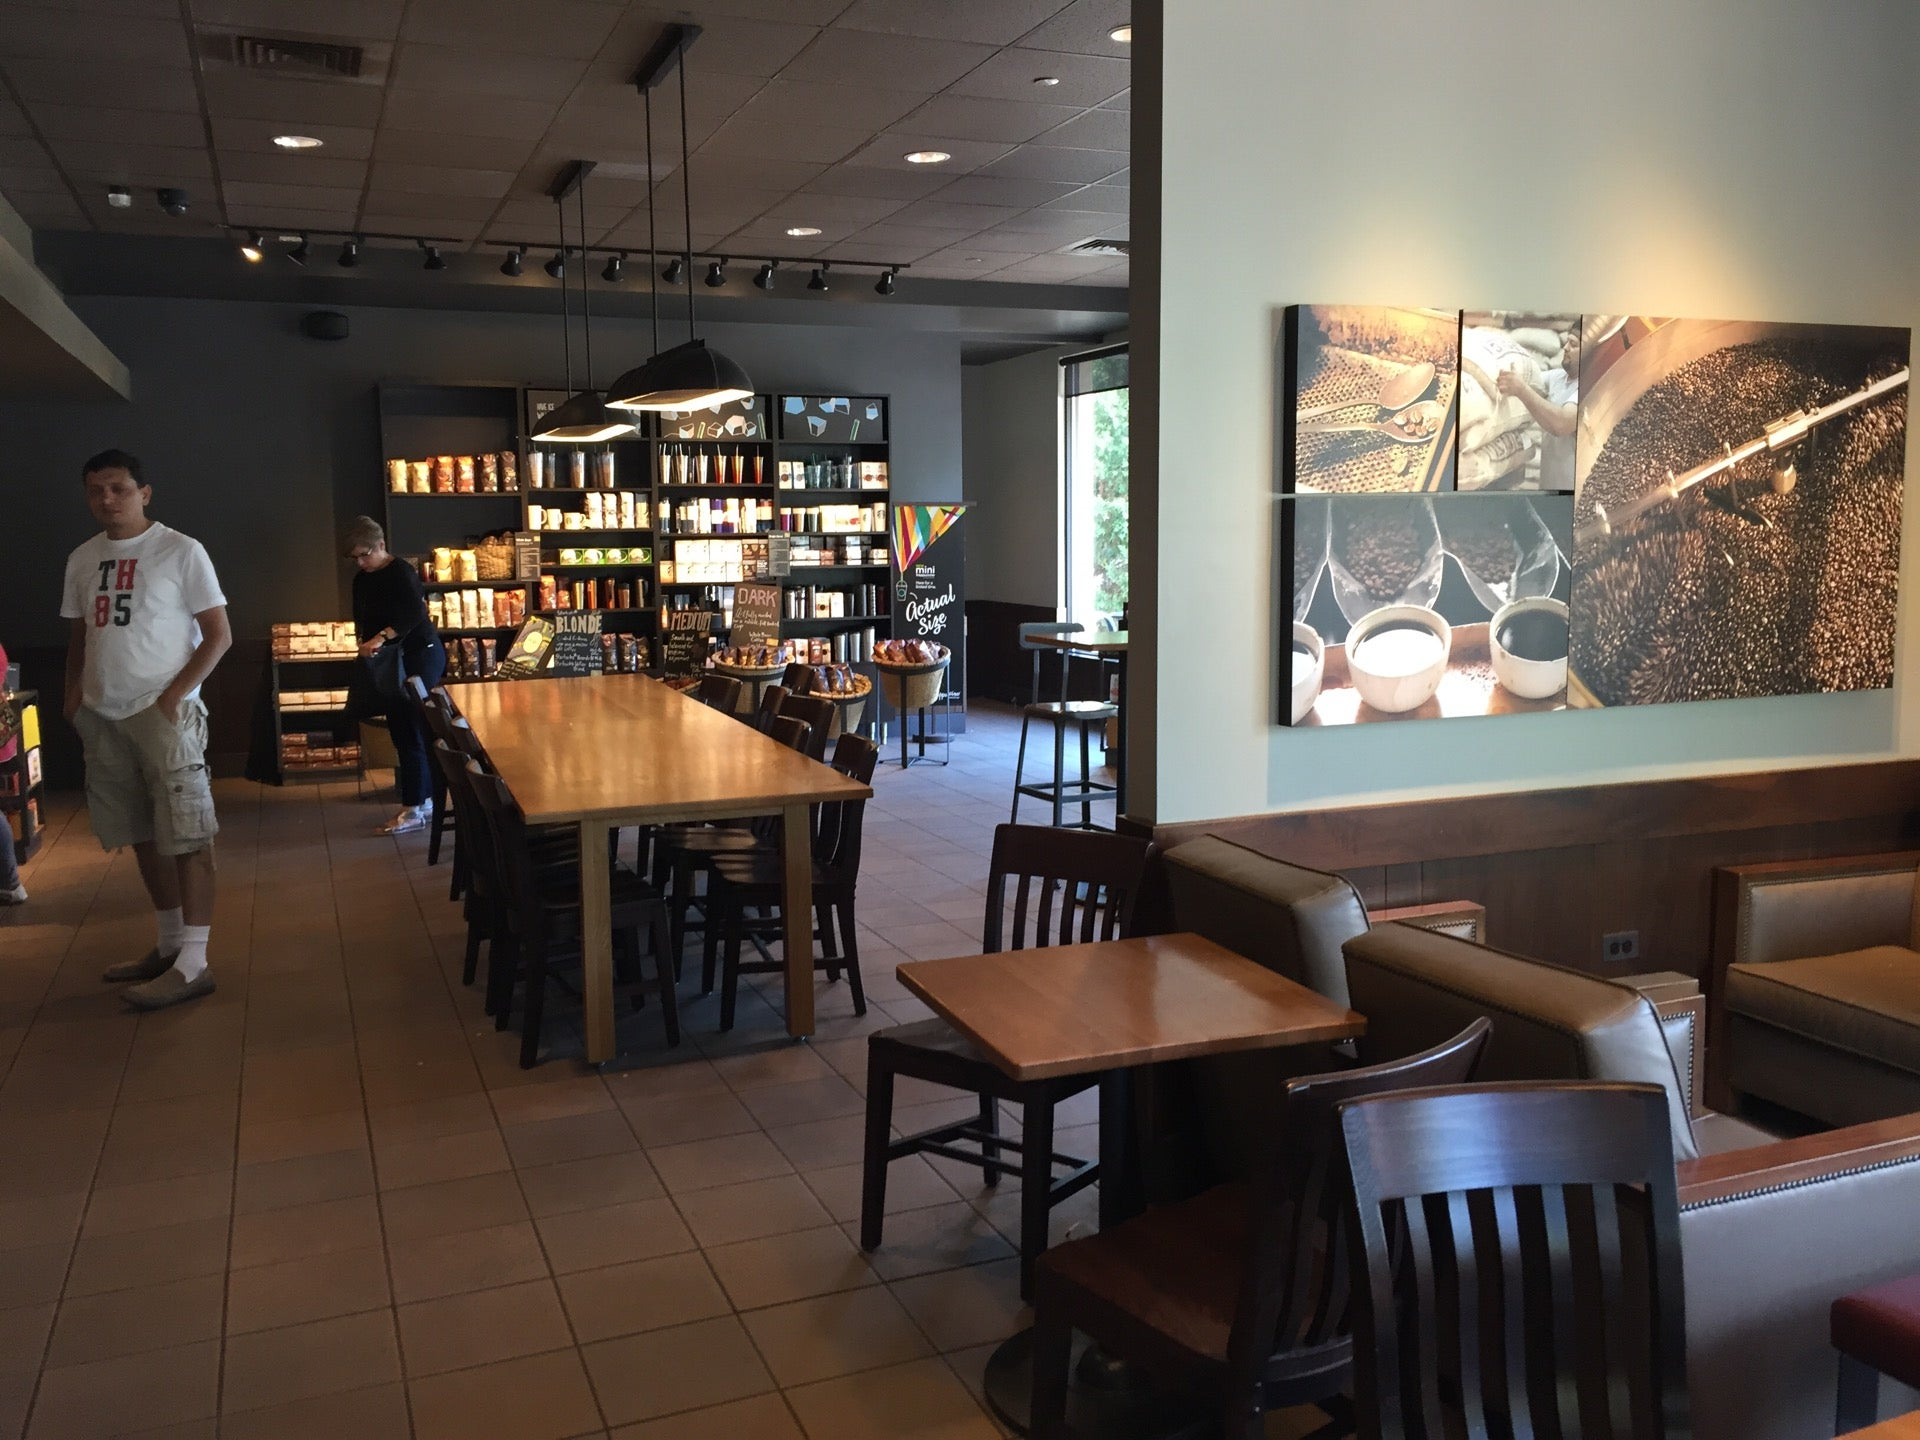 Starbucks Coffee,baked goods,coffee,wi-fi